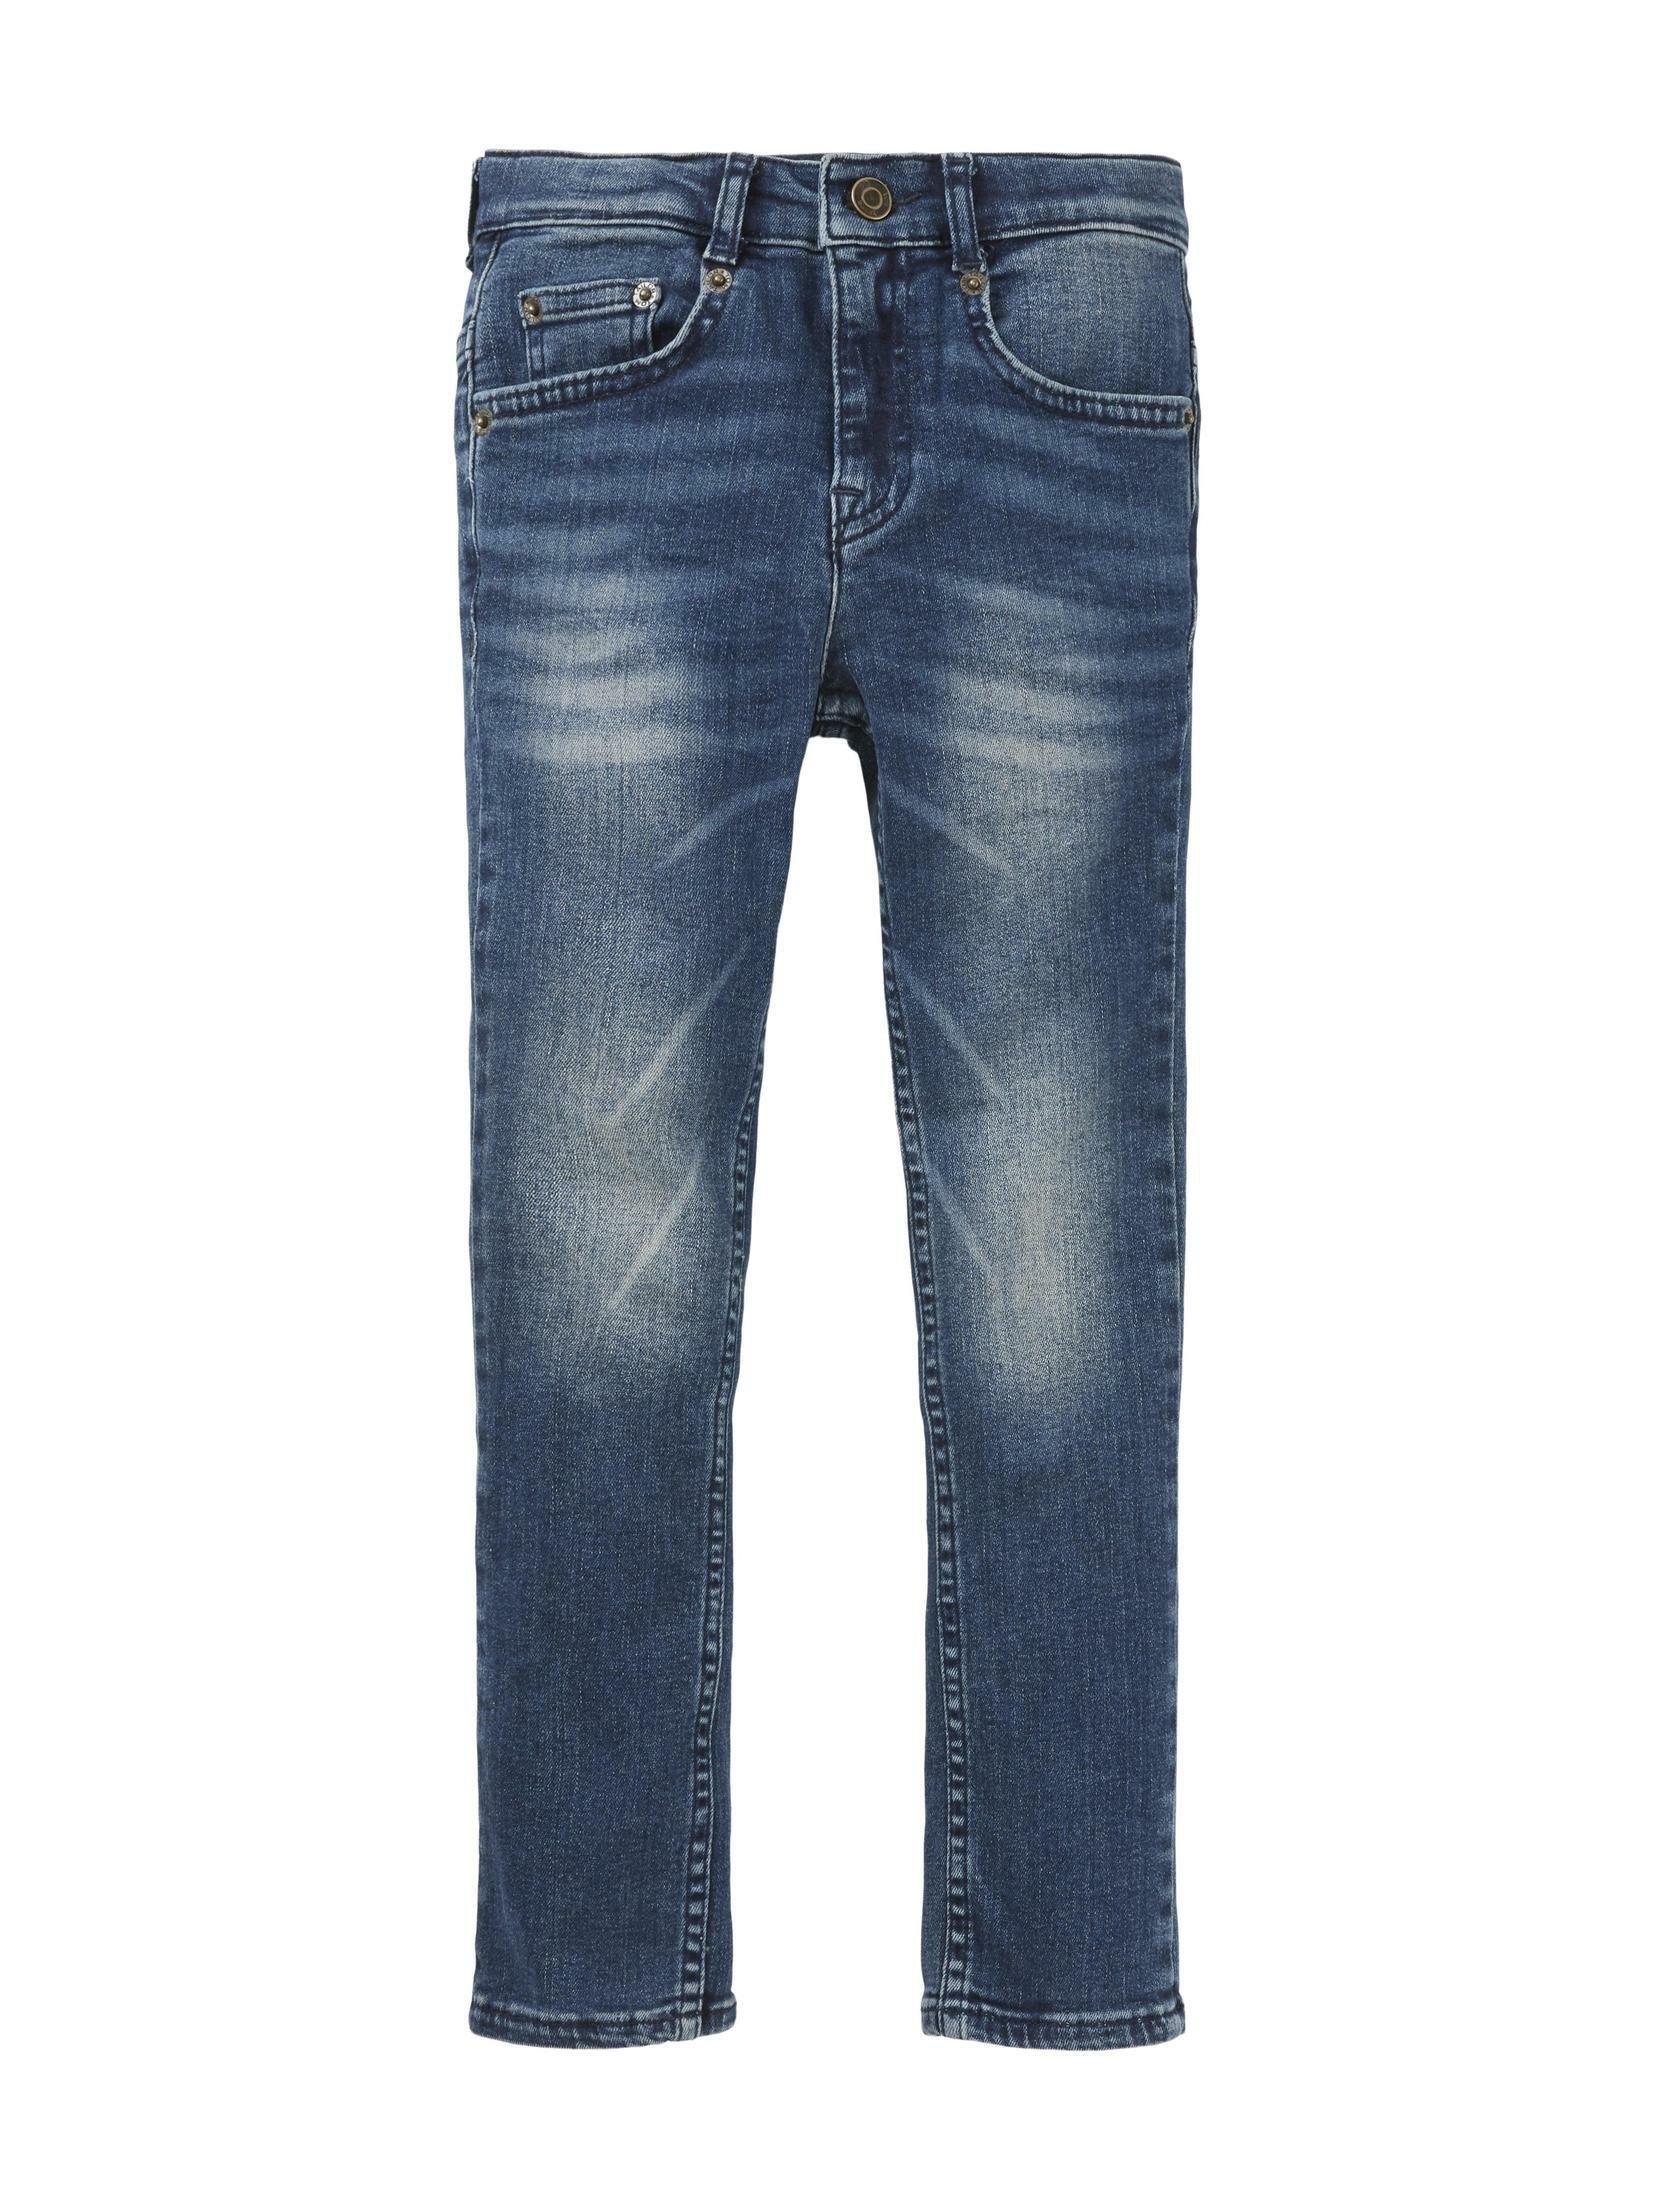 TOM TAILOR straight jeans »Matt Stretch Jeans« bestellen: 30 dagen bedenktijd